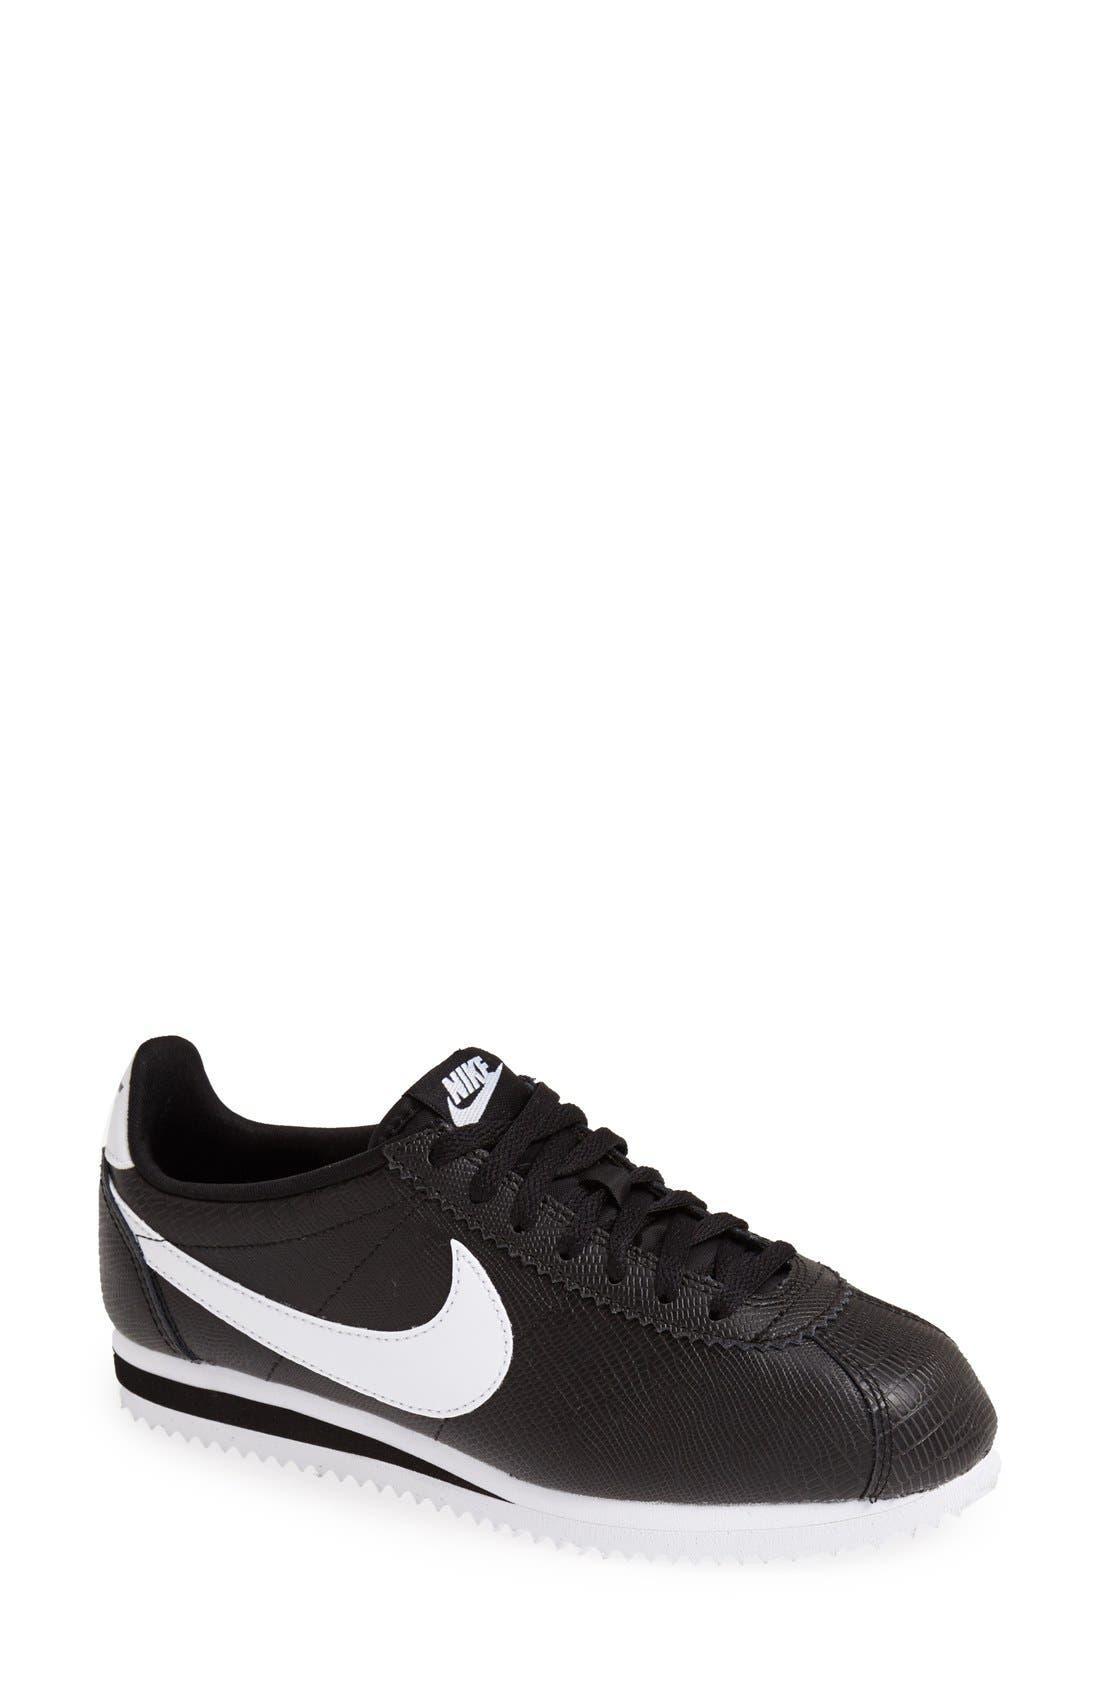 Main Image - Nike 'Classic Cortez' Leather Sneaker (Women)